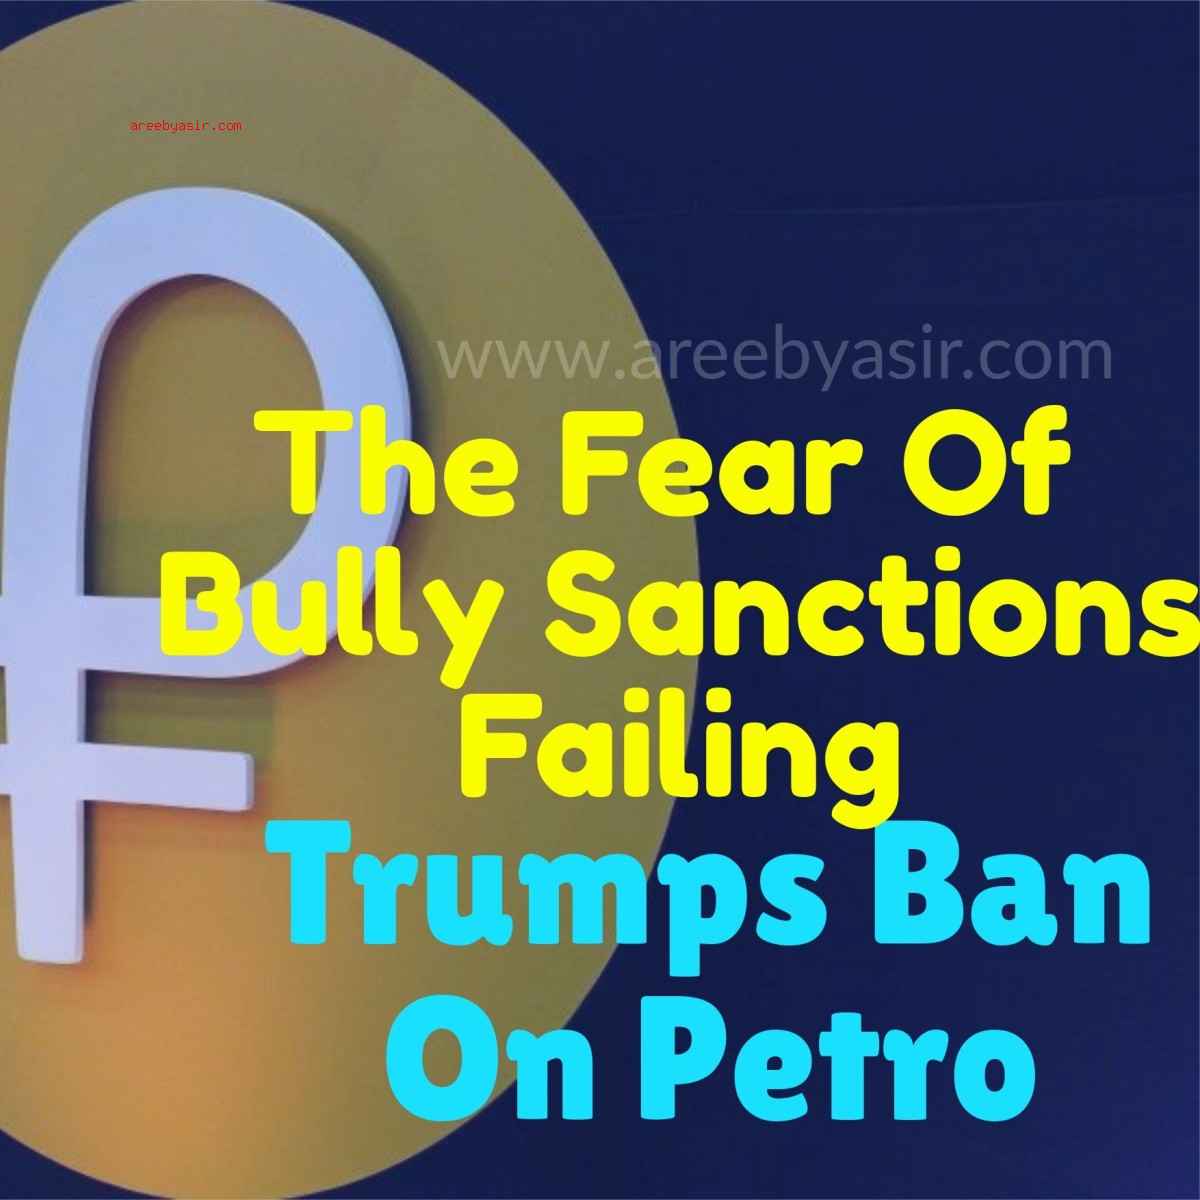 Donald Trump USA Bans Nicolas Maduro's Petro Coin